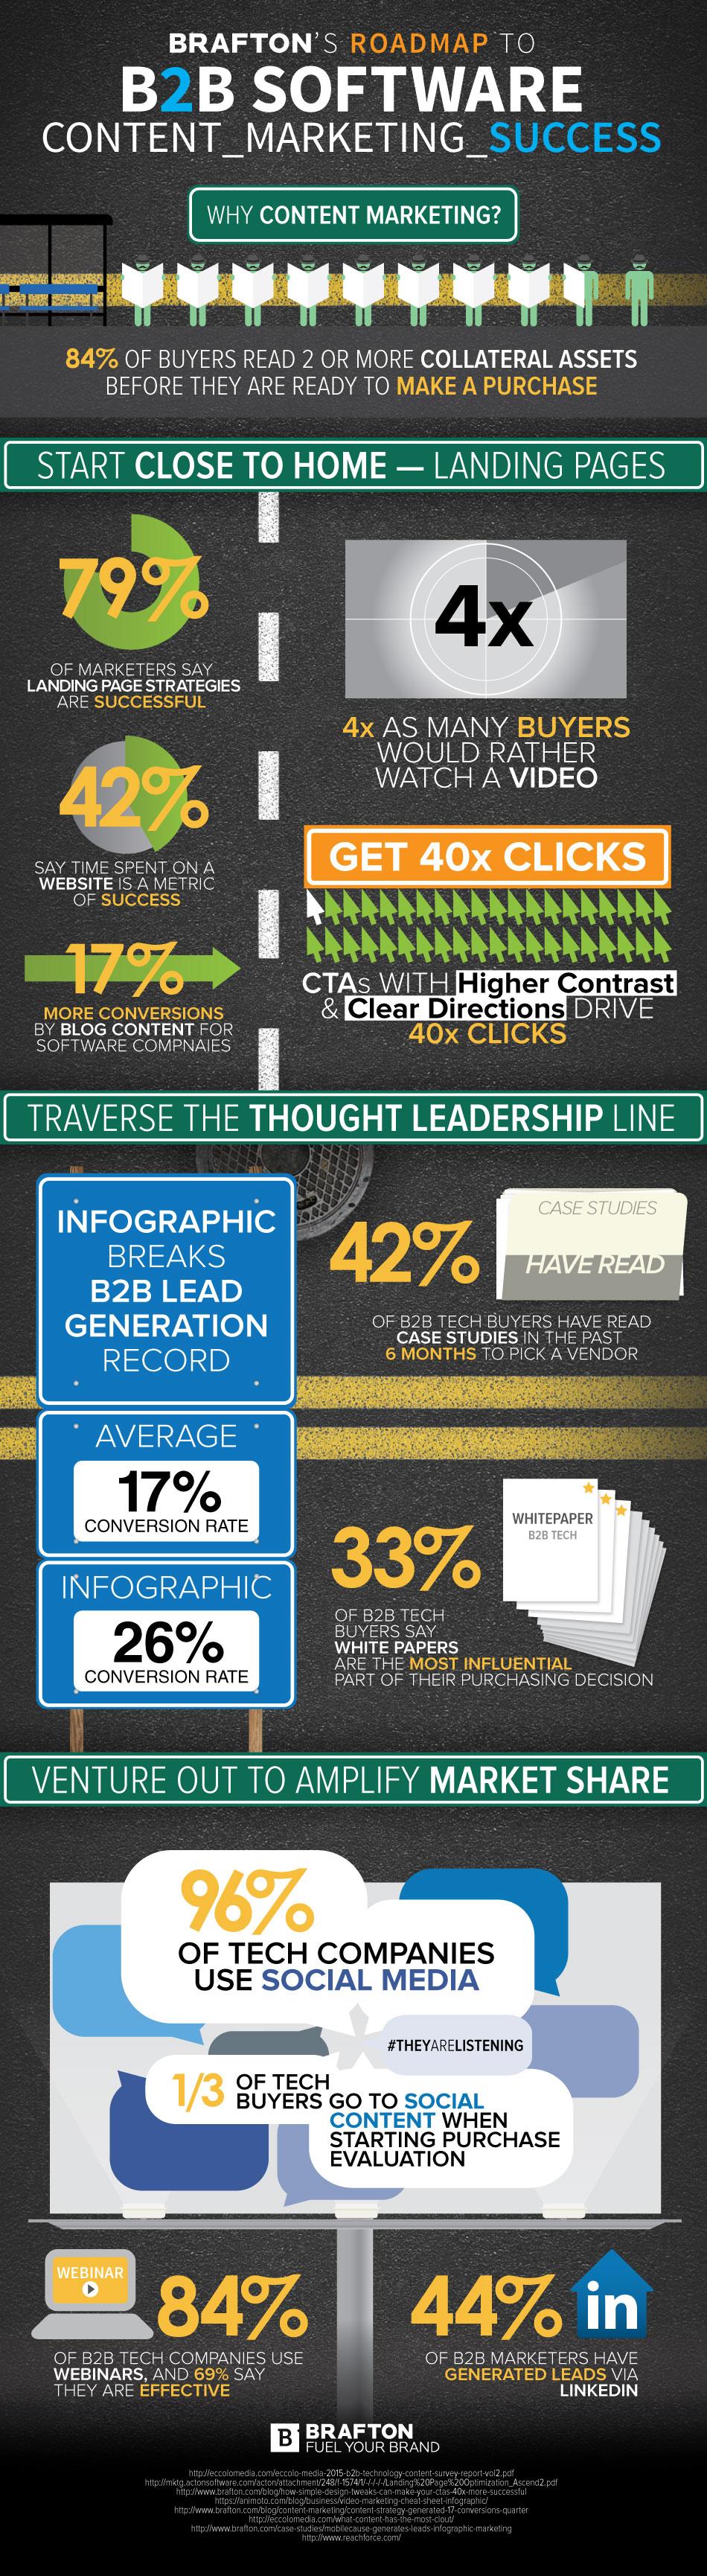 B2BTech_Infographic_High-Lite